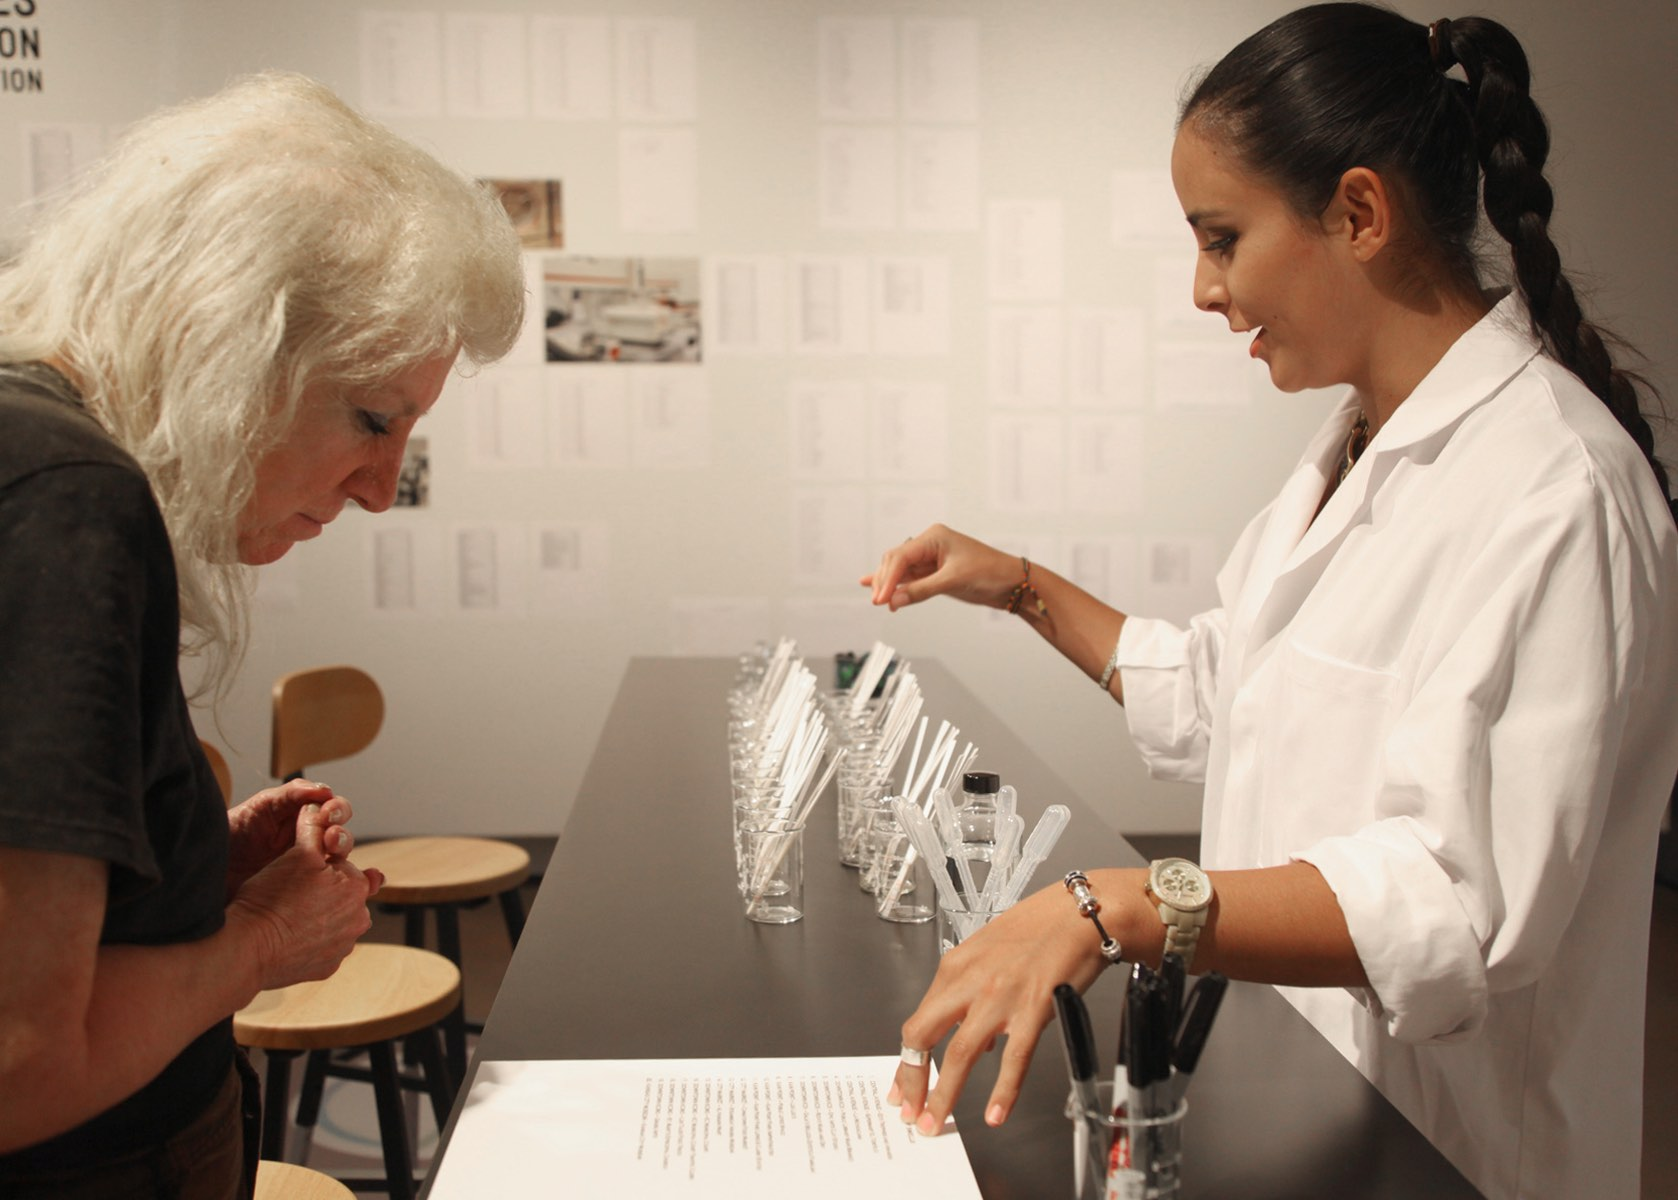 Grand Arts intern Carolina Aranibar-Fernandez helps a visitor at the smell micro-lab, 2012.